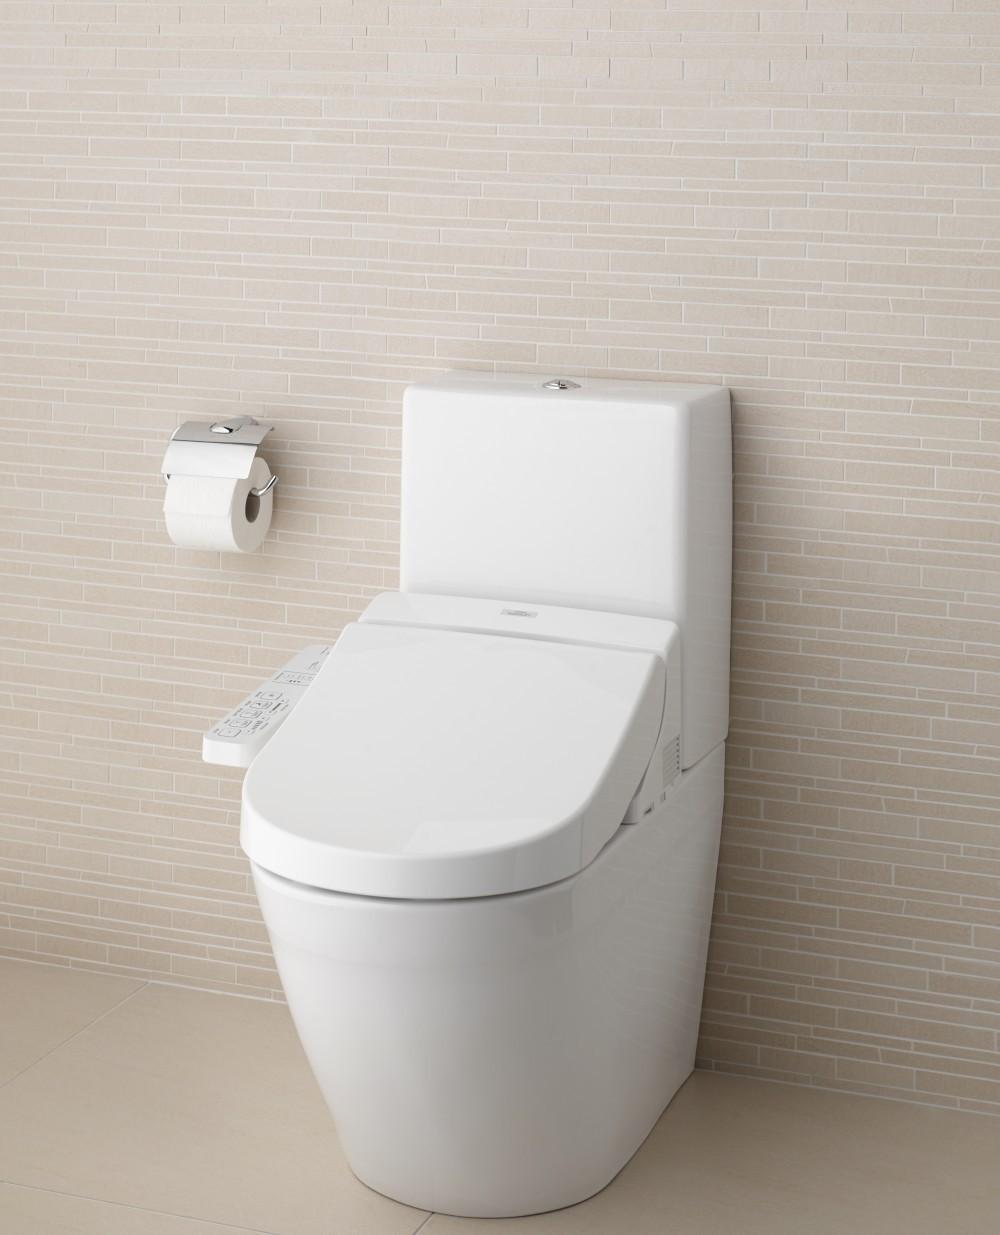 TOTO Kombination - Washlet EK 2.0 + WC MH CW161Y/SW10044G mit Spülkasten